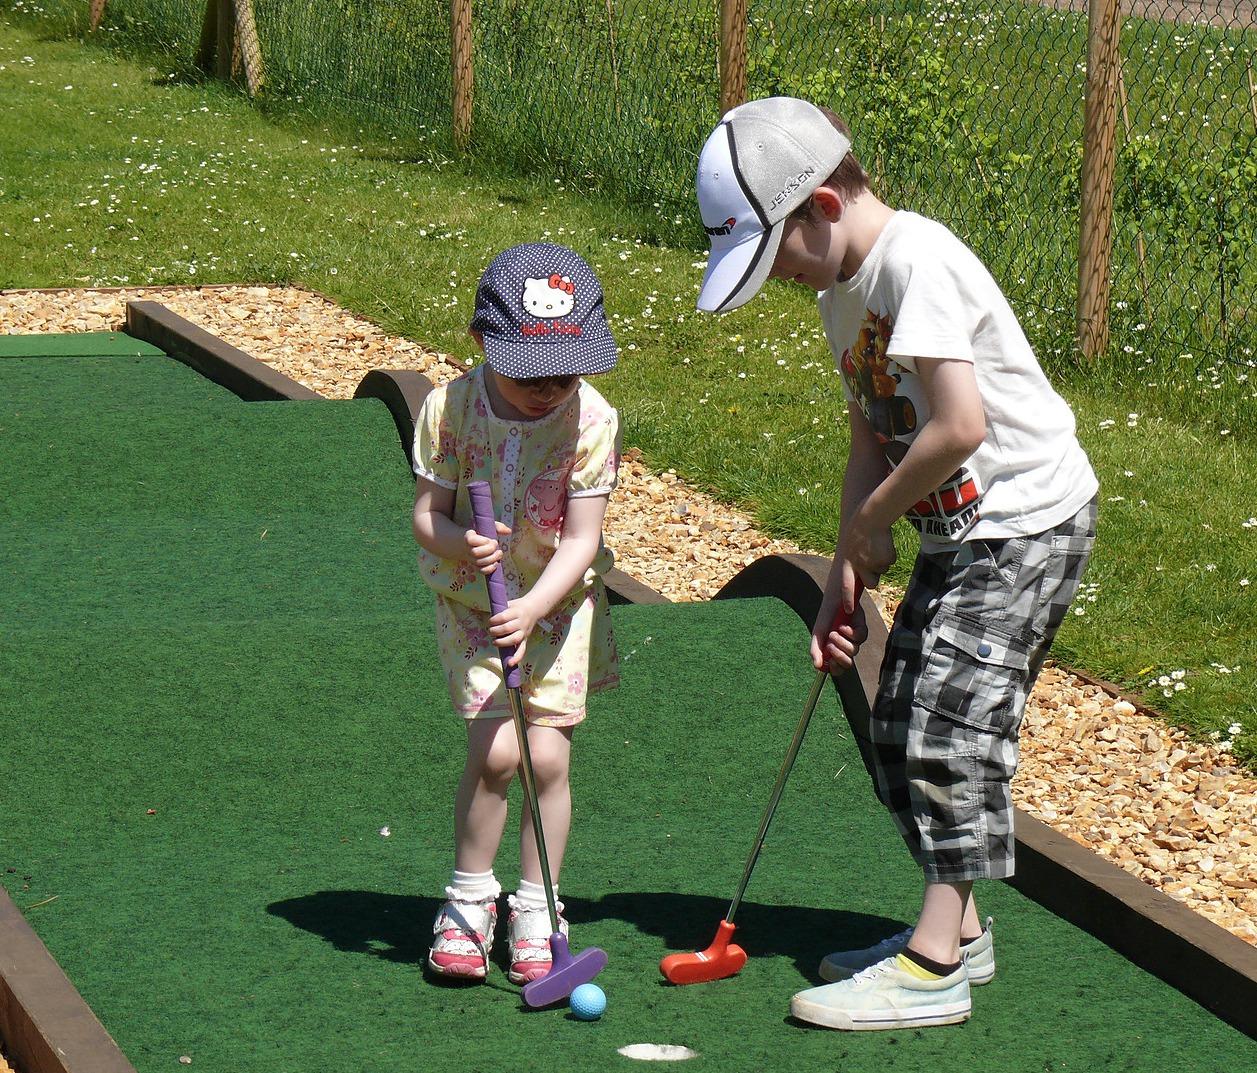 Crazy Golf at Eaton Park